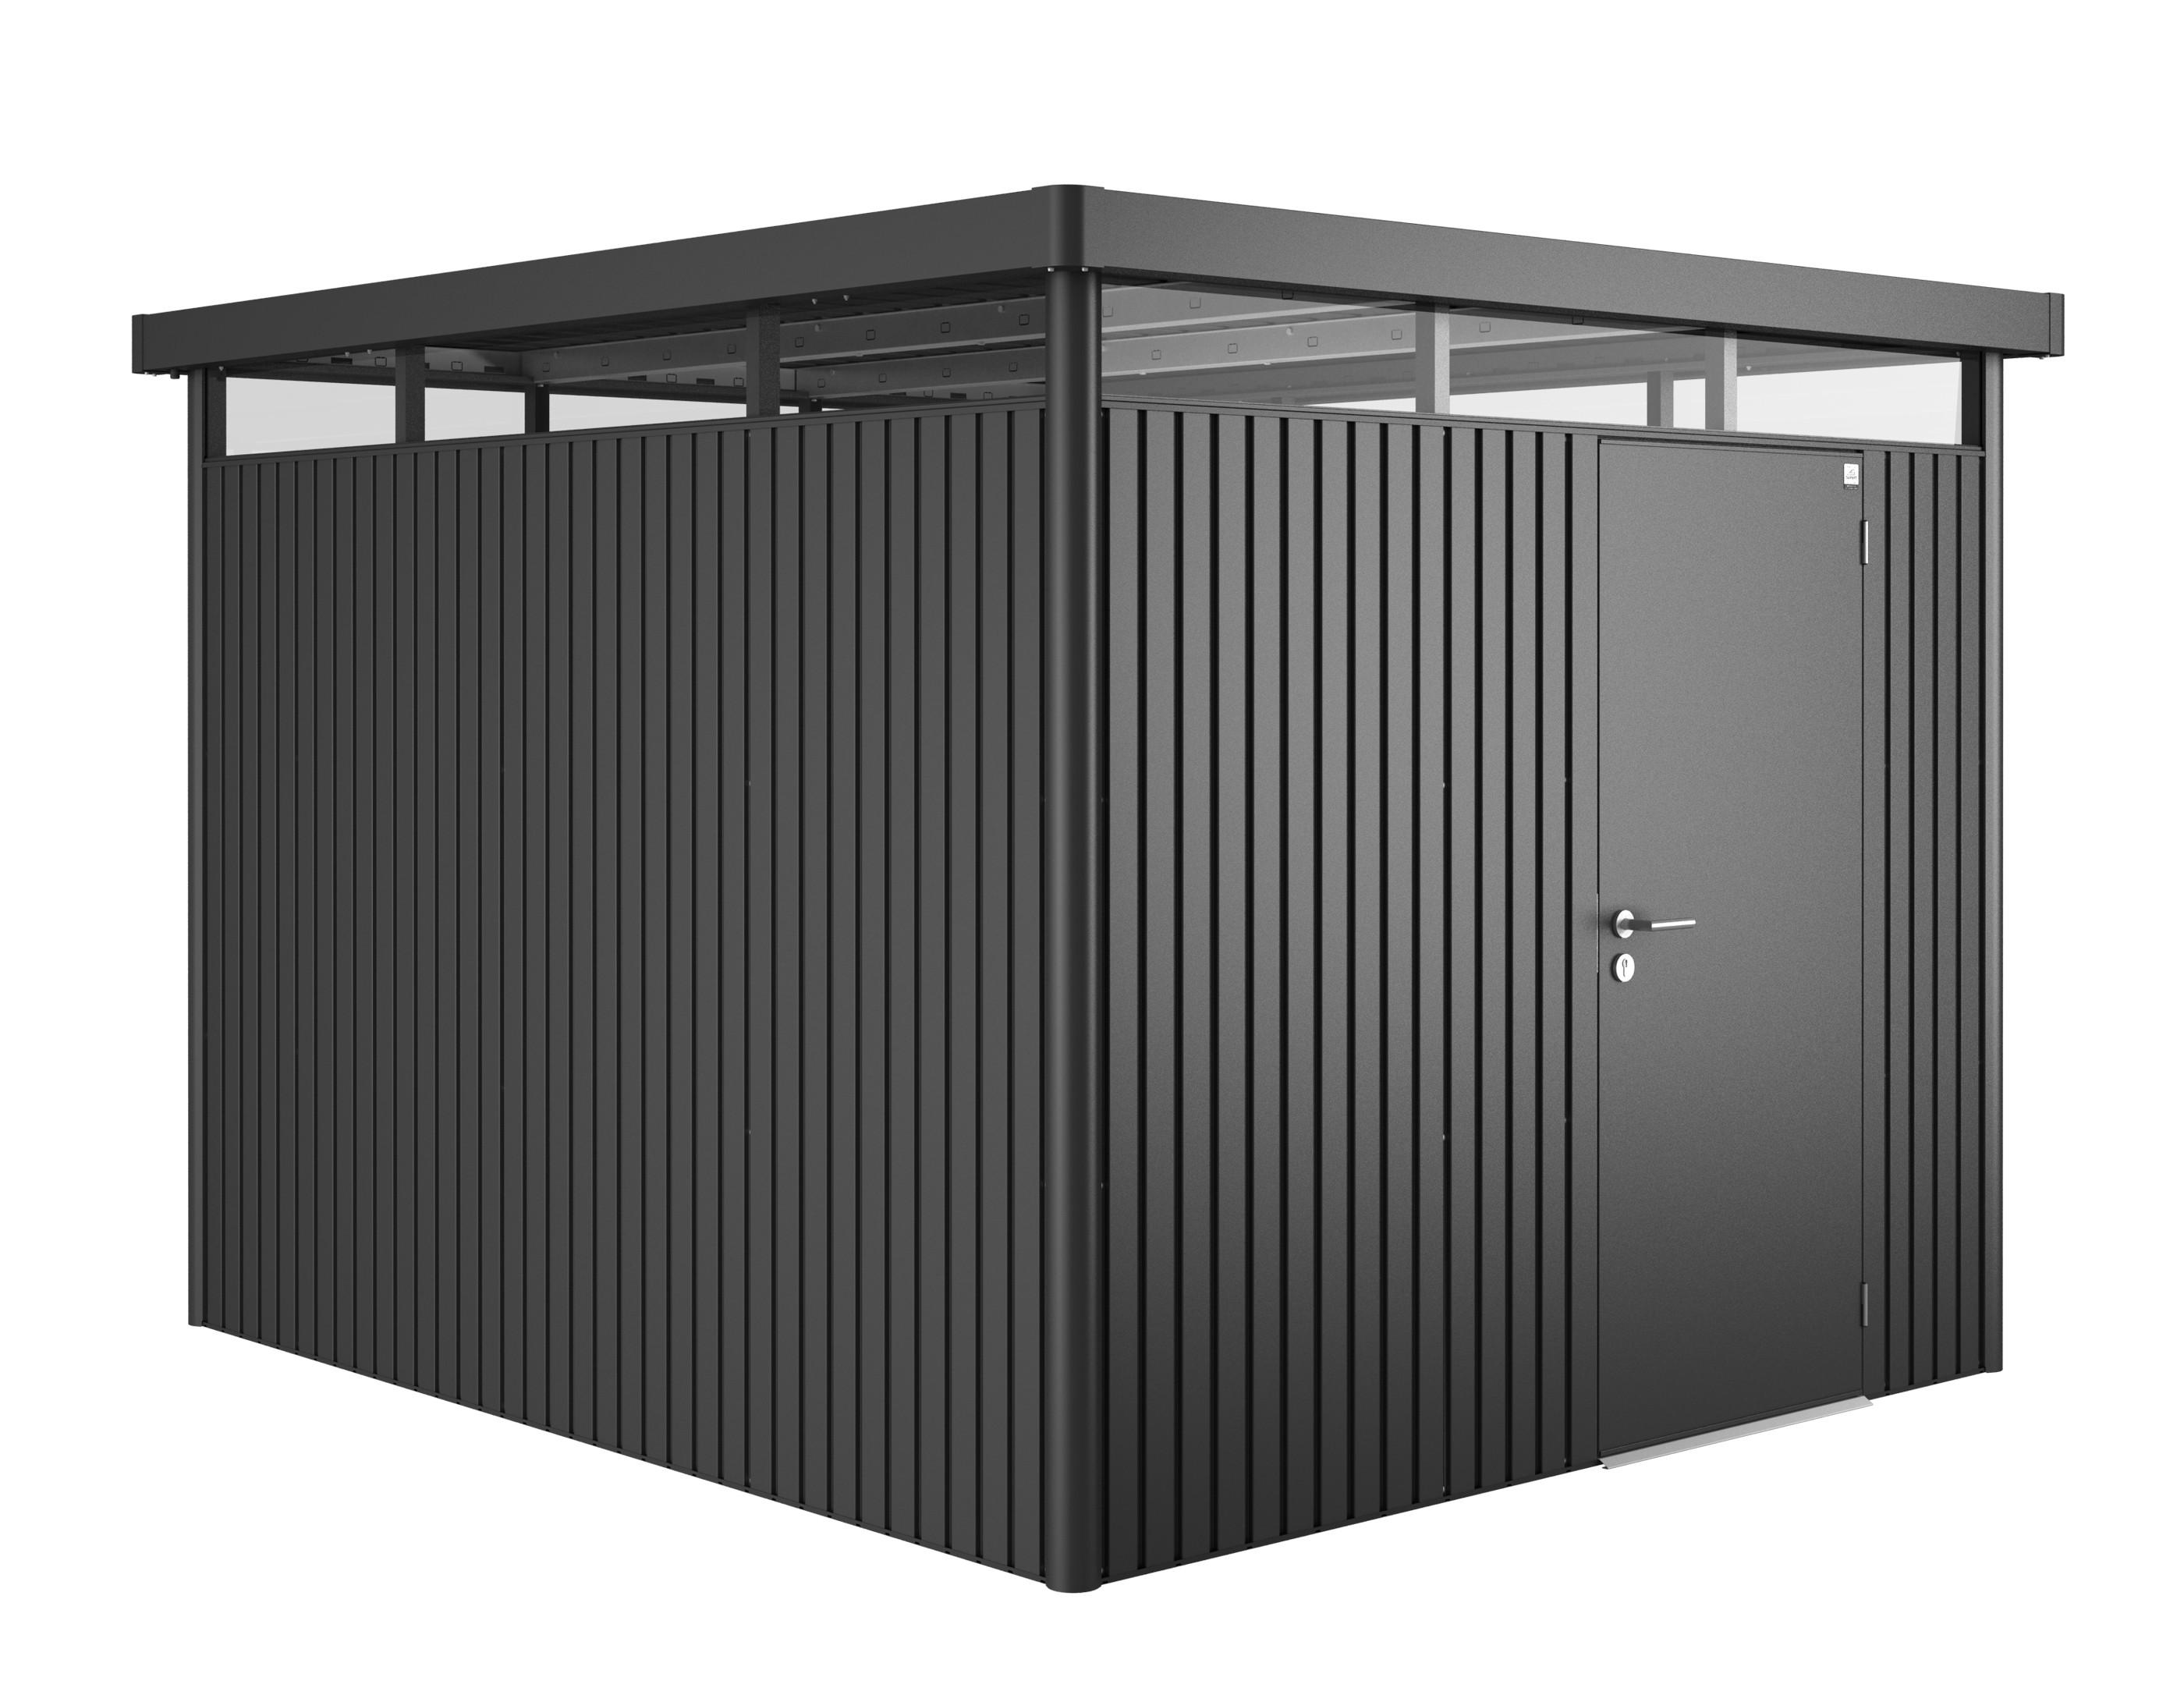 ger tehaus biohort highline h5 dunkelgrau metallic 275x315x222cm bei. Black Bedroom Furniture Sets. Home Design Ideas